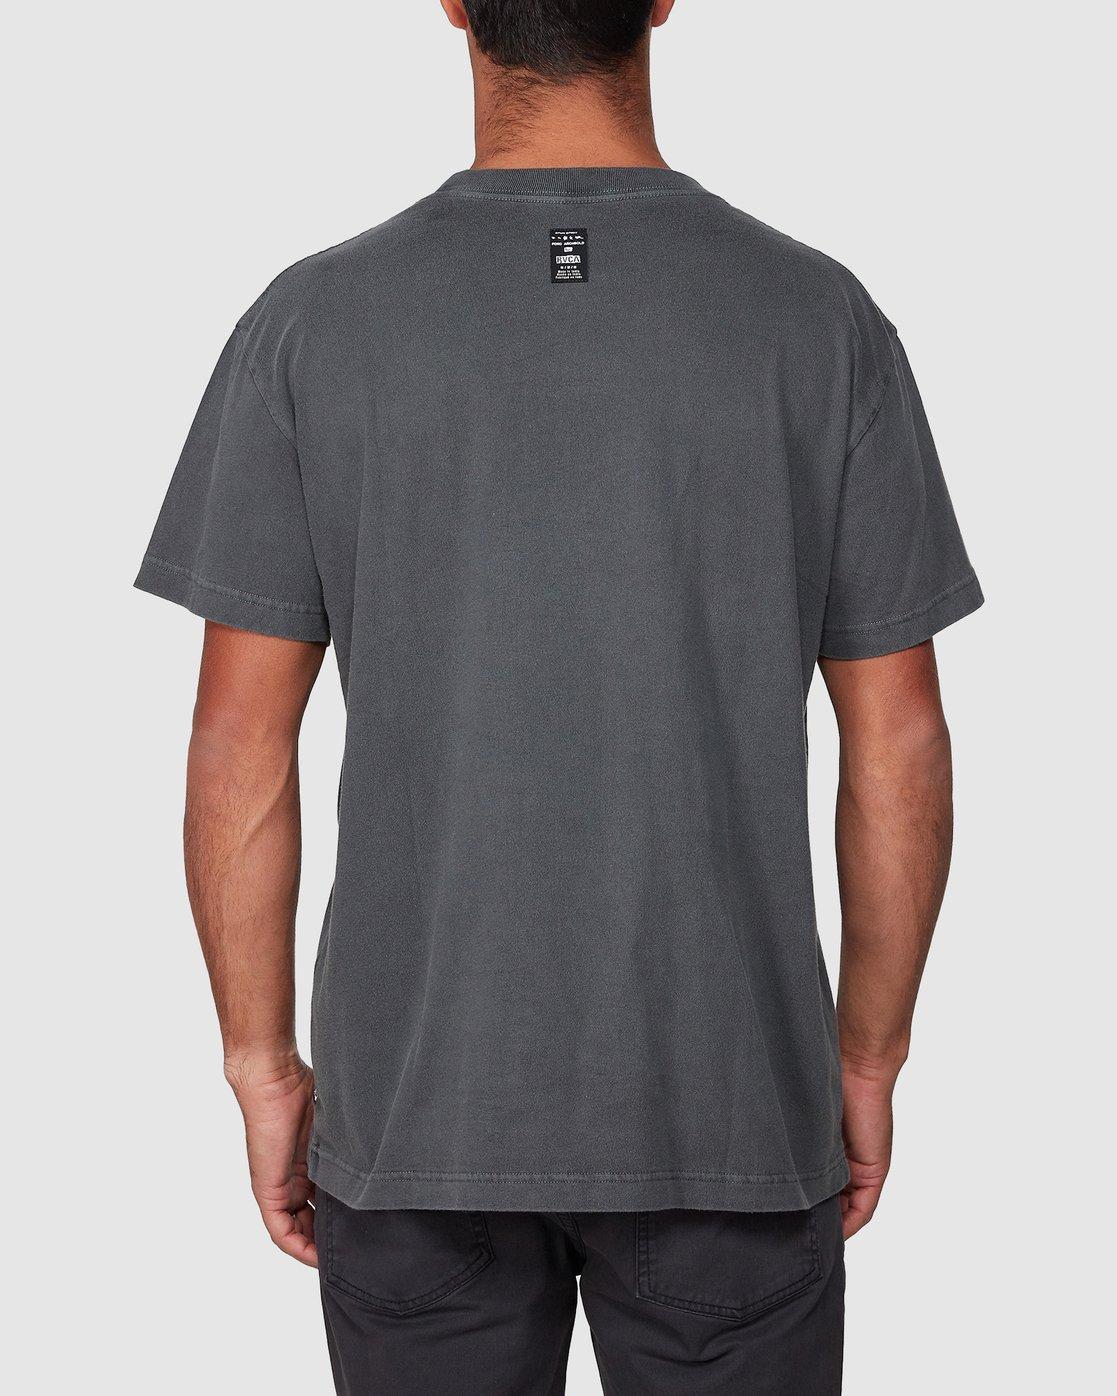 3 Spun Spirit Short Sleeve Tee Black R107068 RVCA